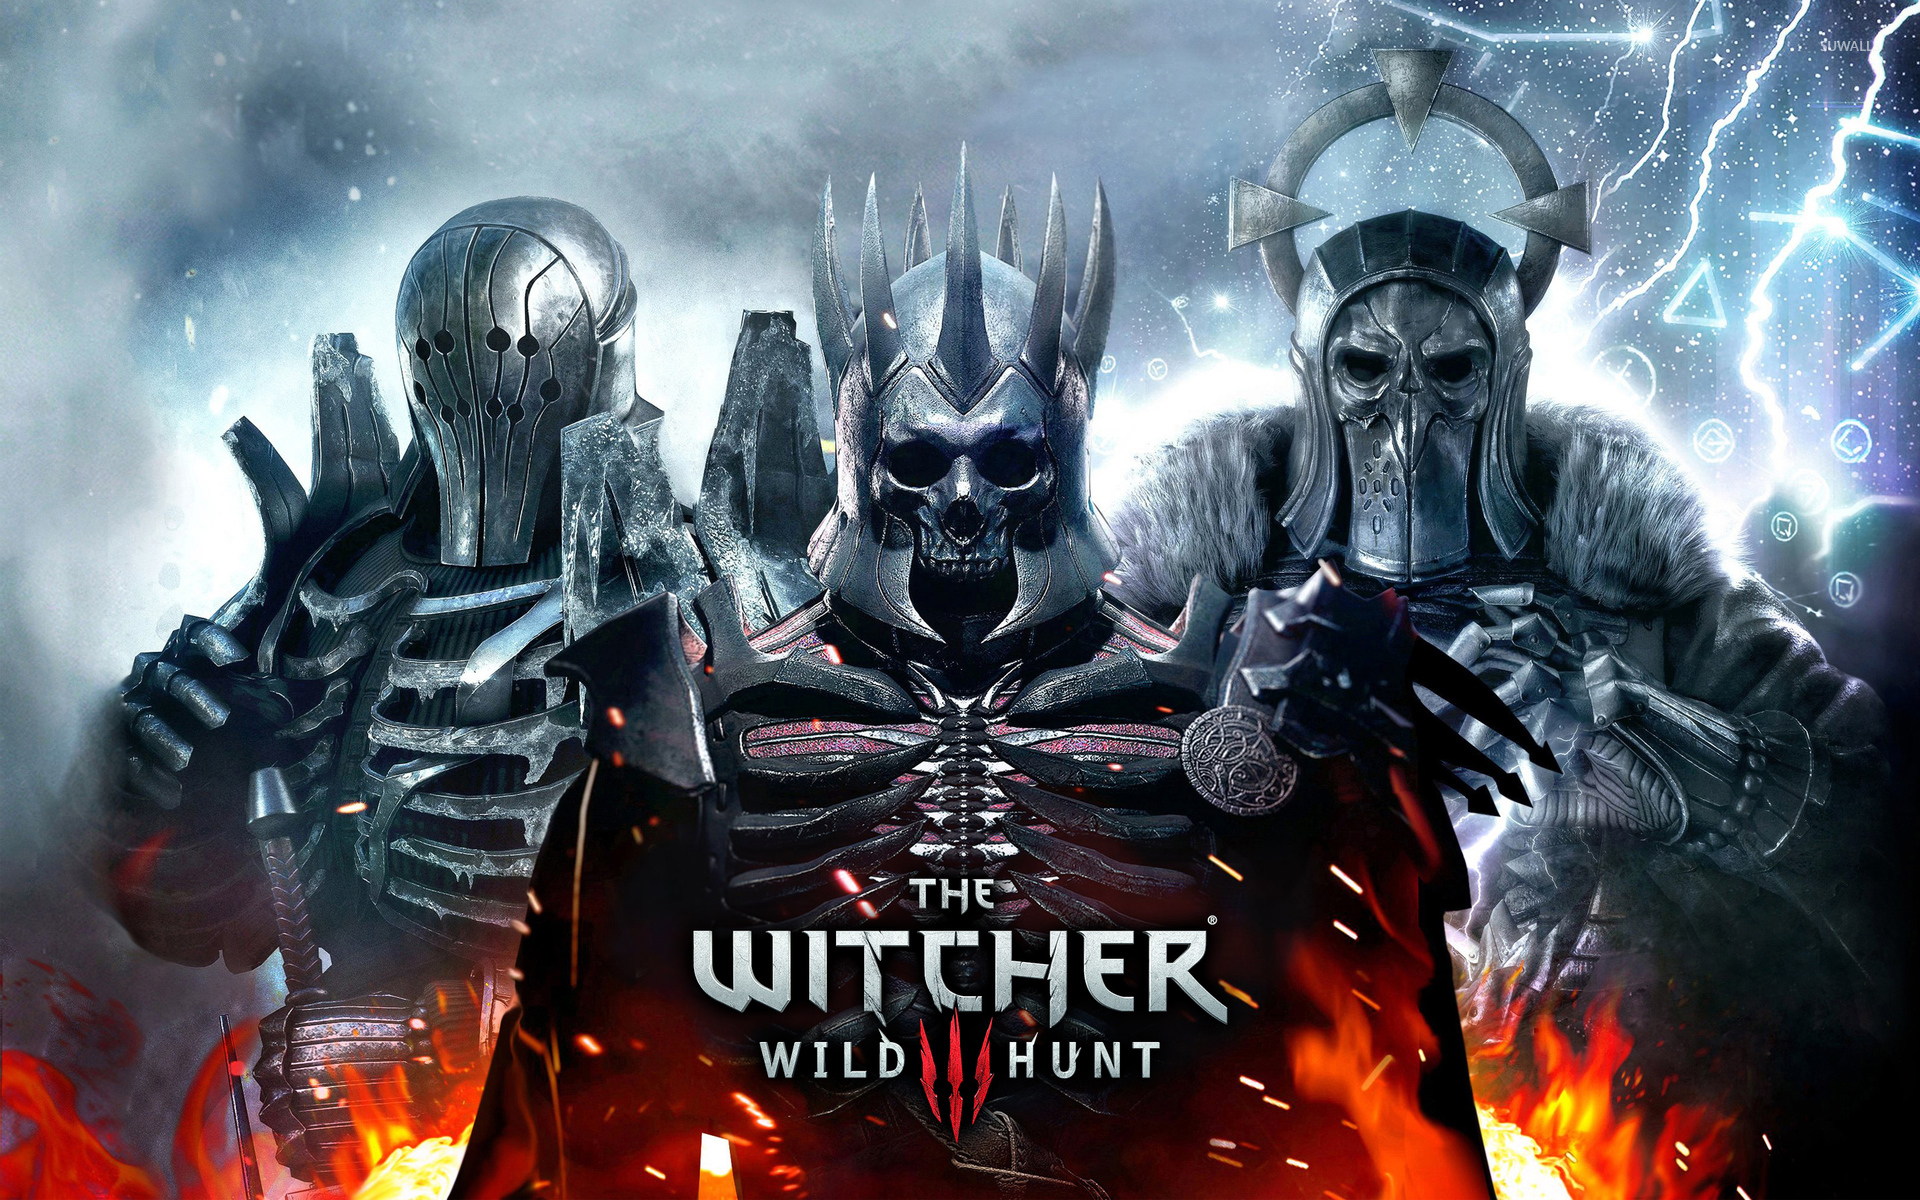 Witcher 3 Wallpaper 1360x768 - WallpaperSafari